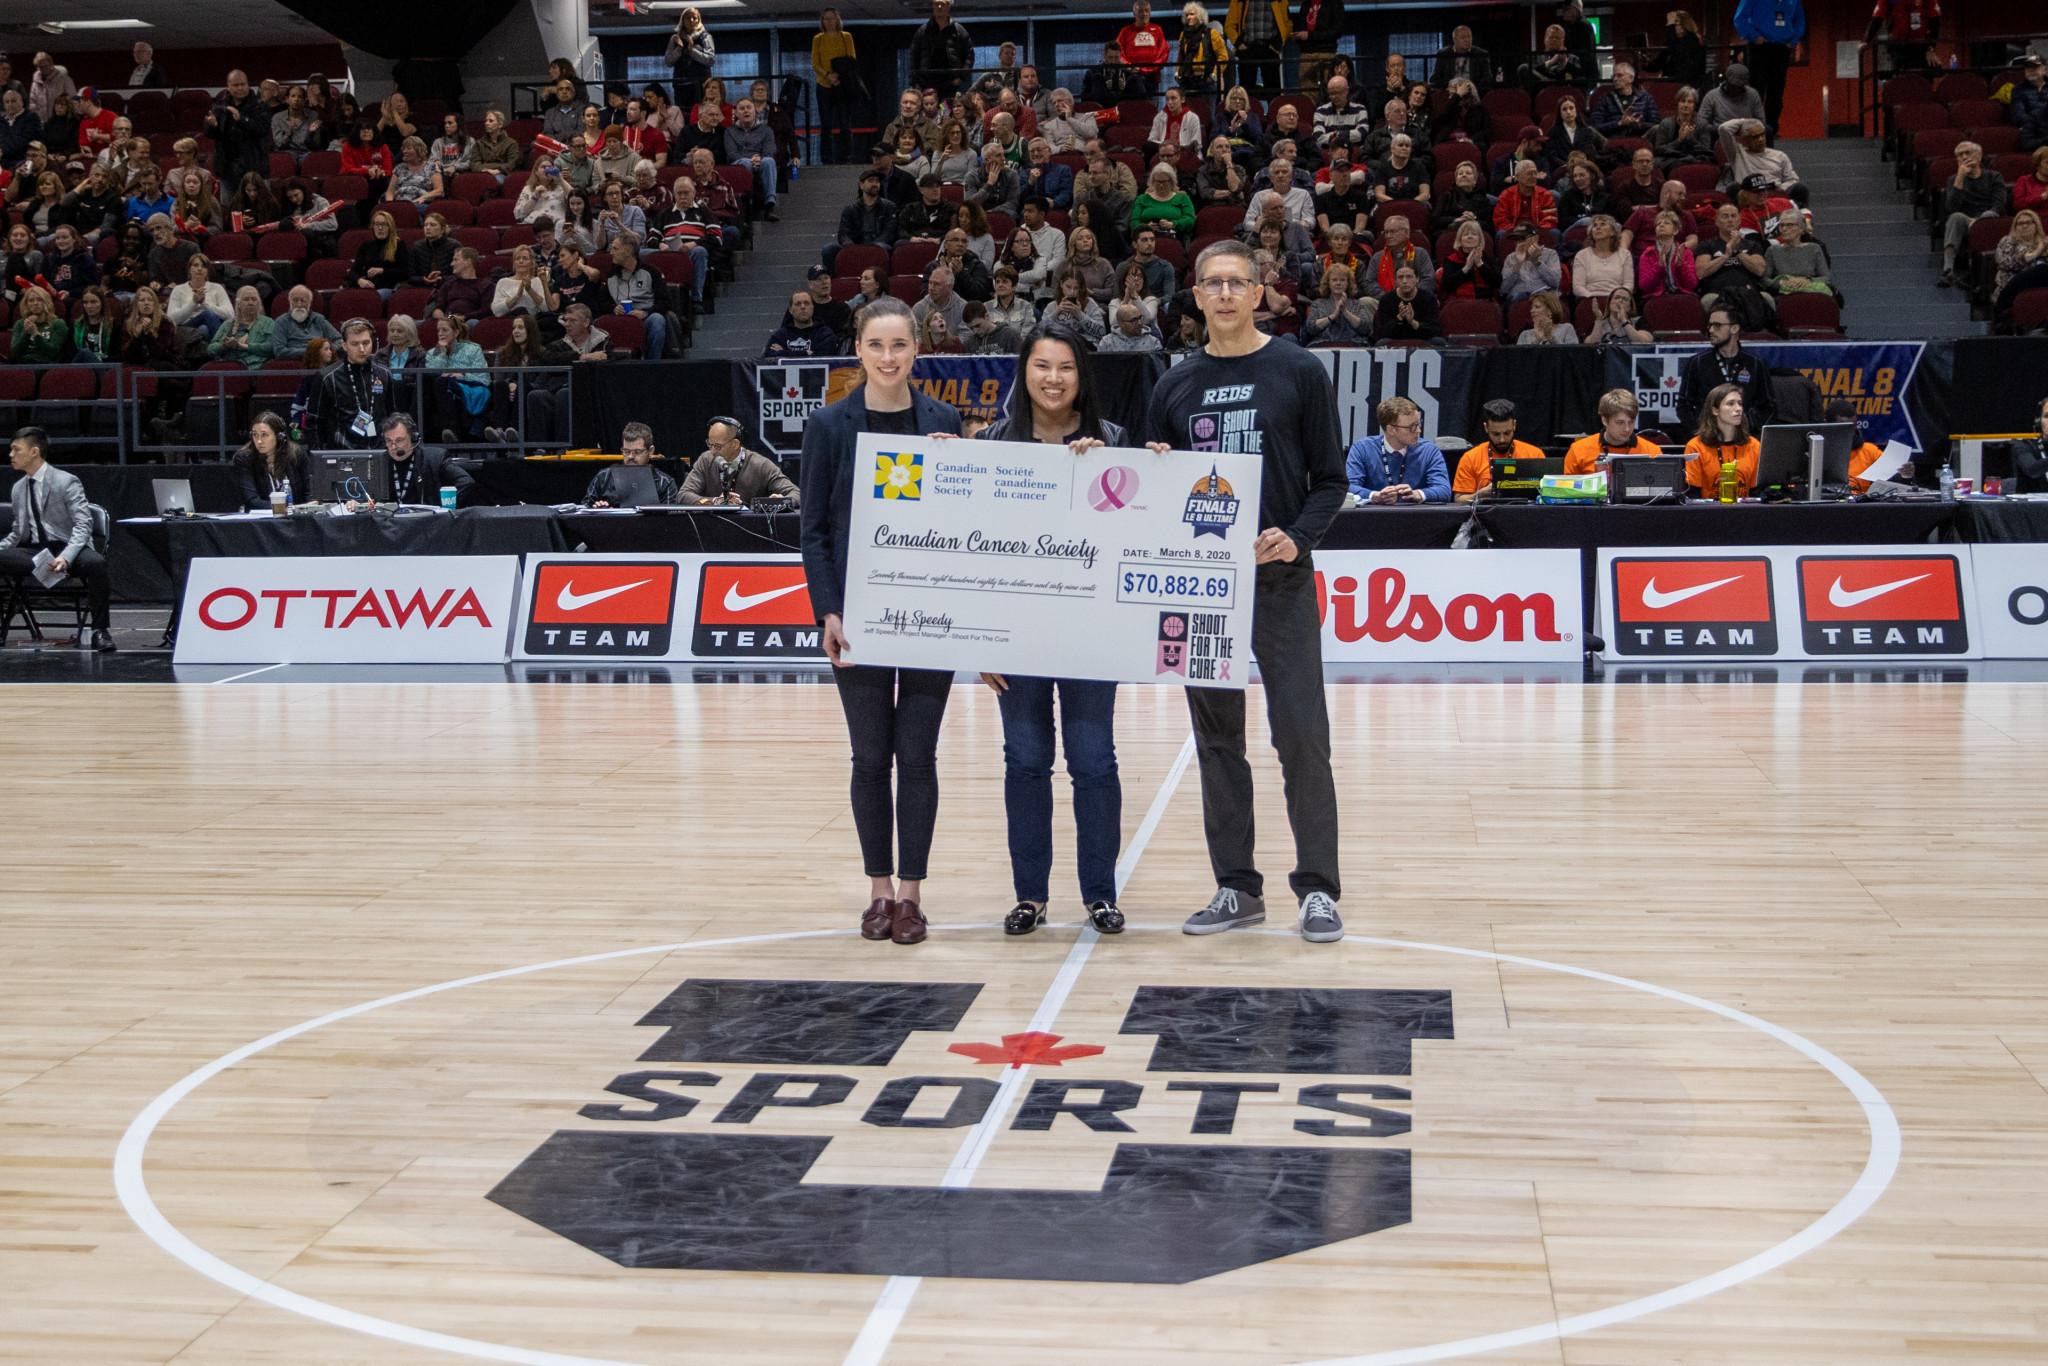 U SPORTS women's basketball fundraising initiative raises $106,000